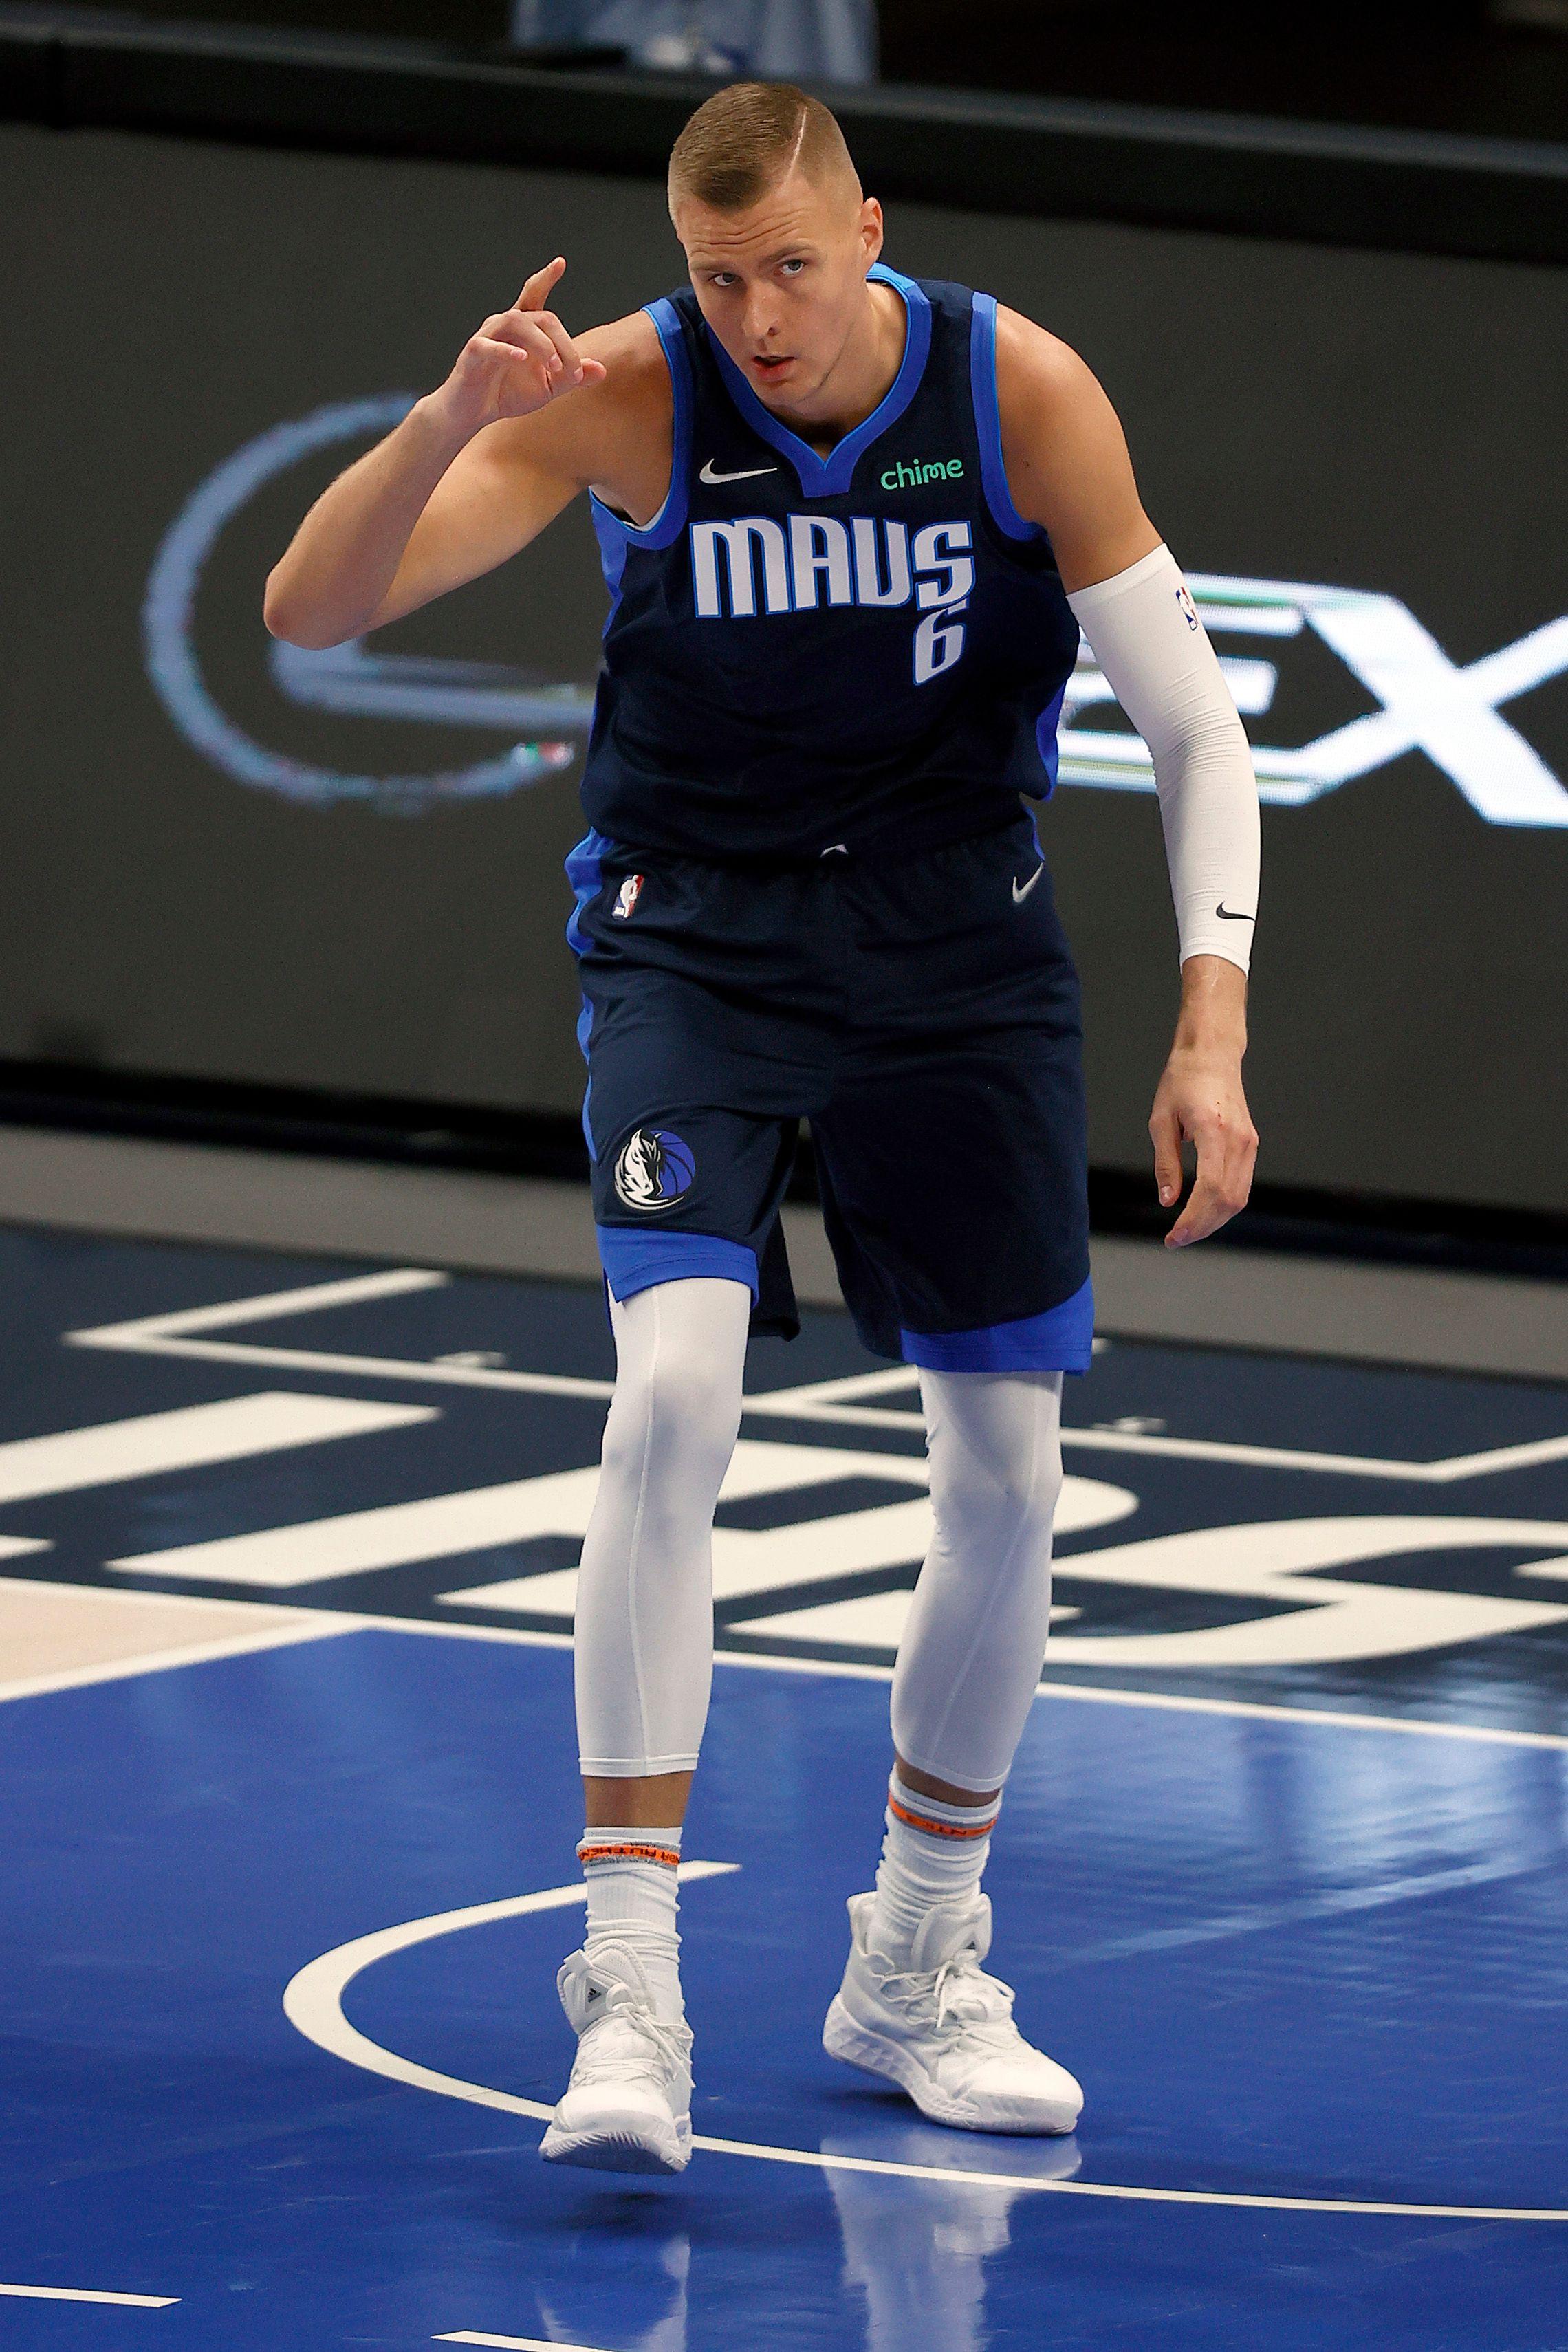 Kristaps Porzingis demanding the ball from his teammate